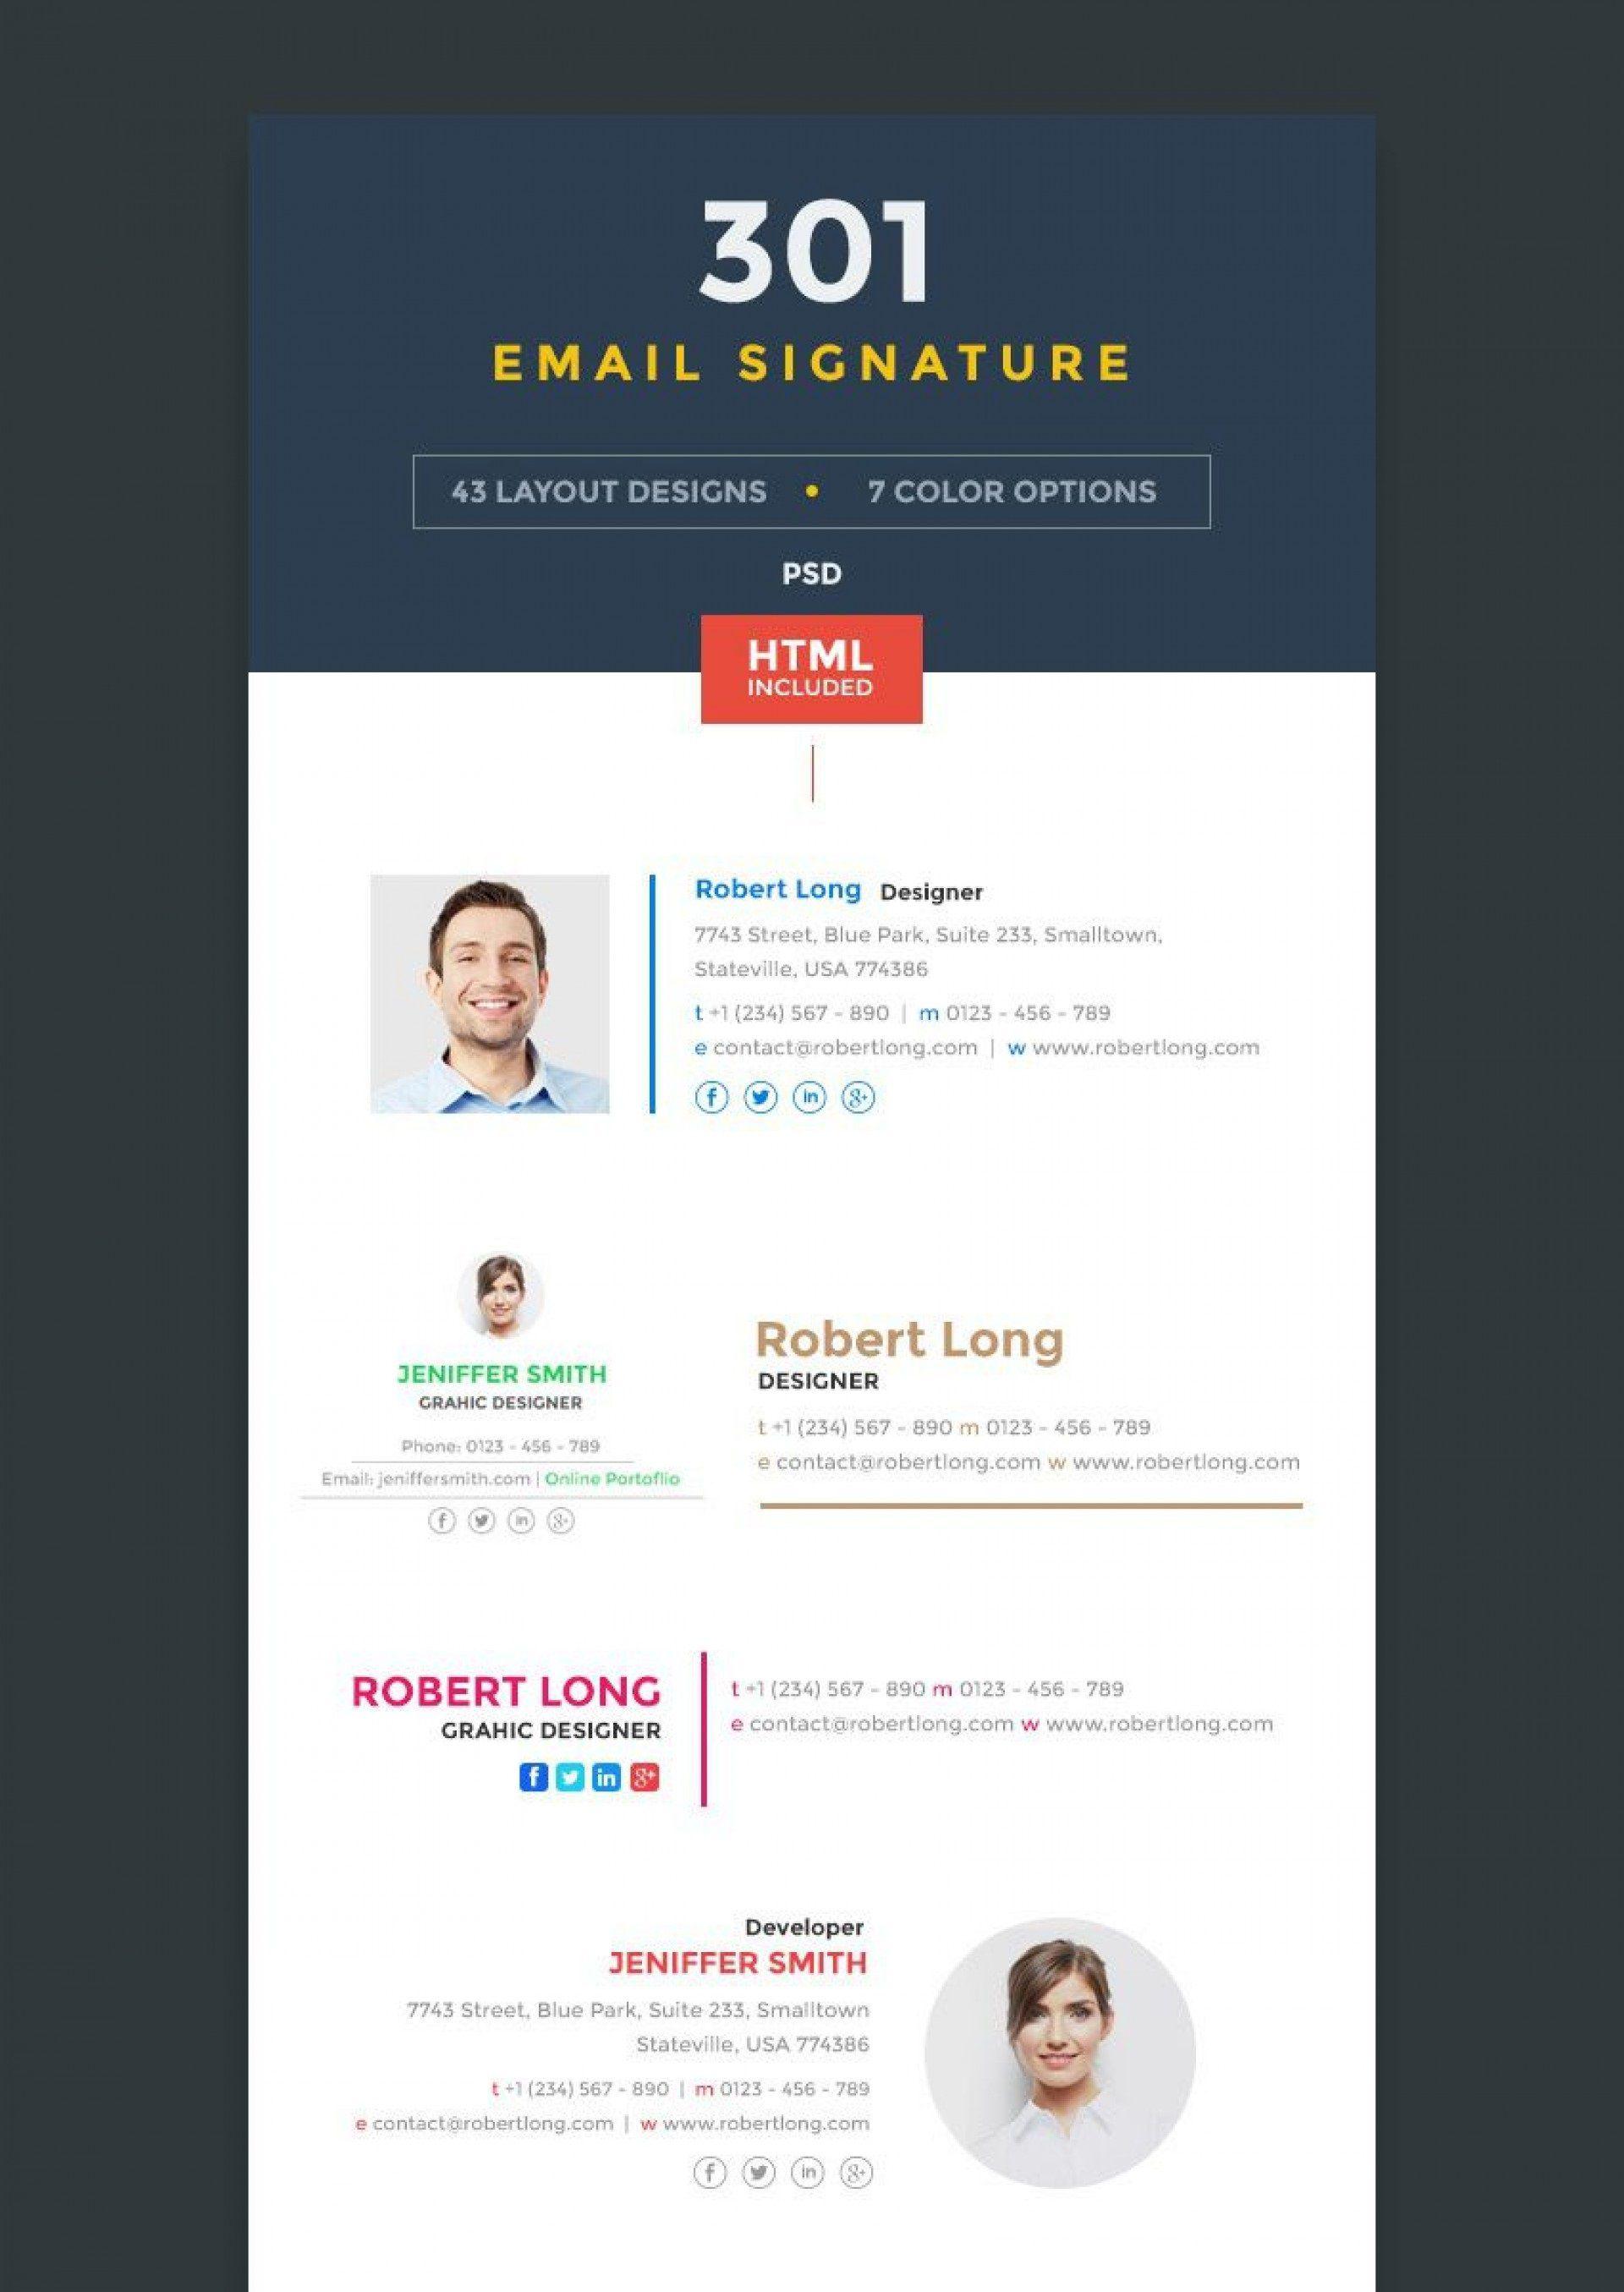 007 Shocking Email Signature Design Outlook Free Image Full